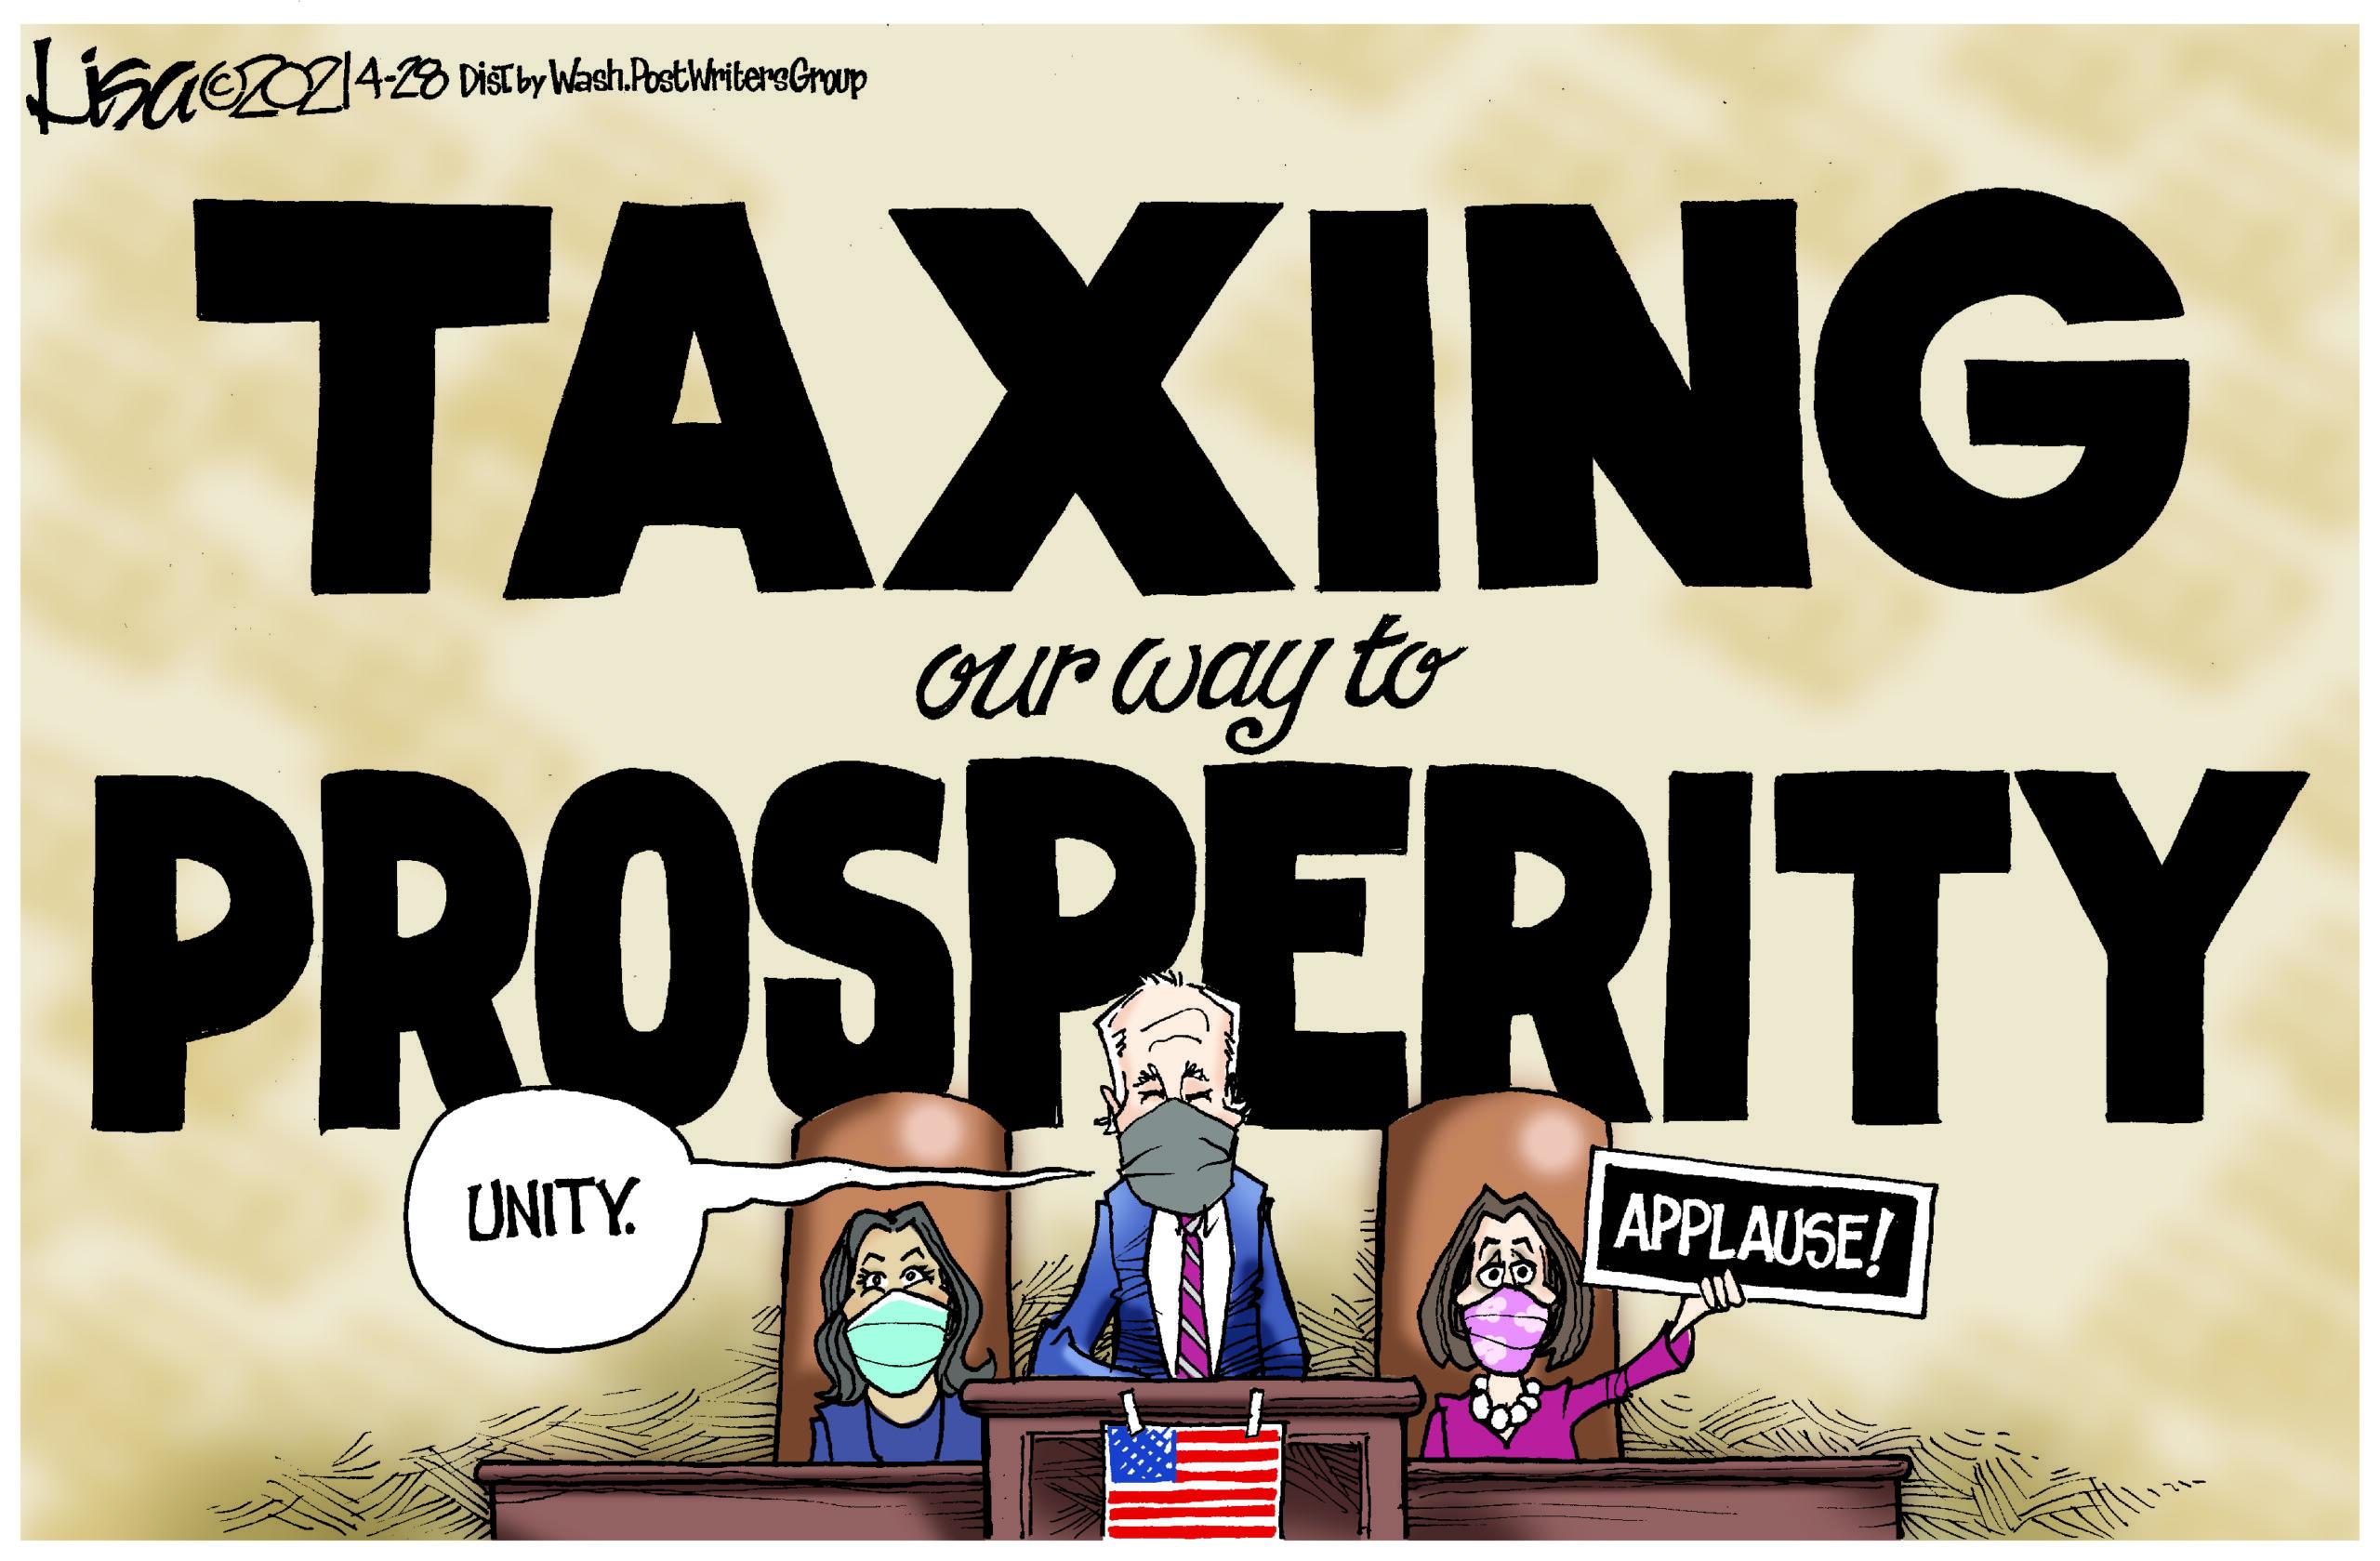 May 1: Taxing Prosperity